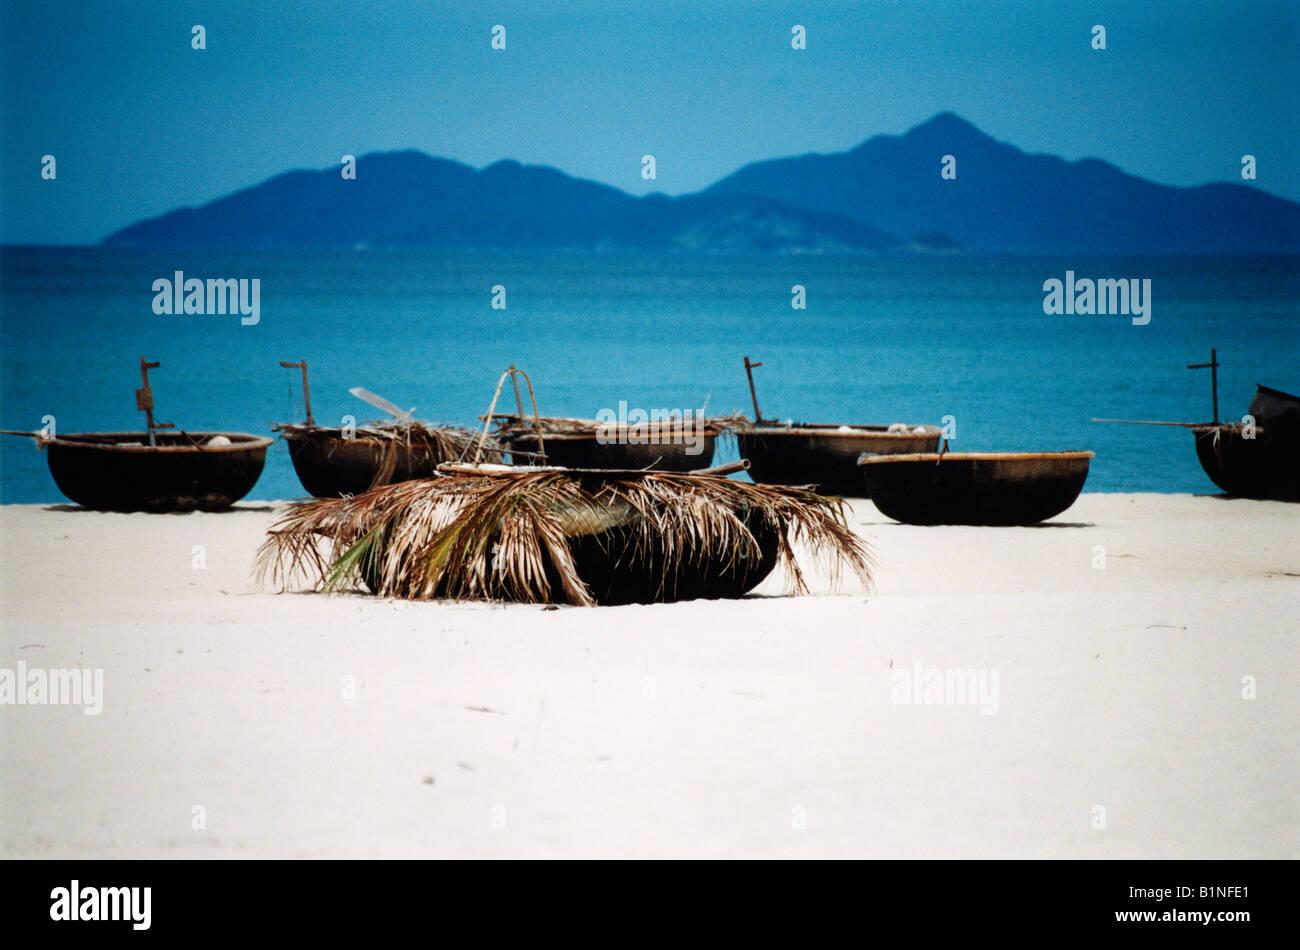 Vietnam Fishing Boats On China Beach Bai Non Nuoc South China Sea Da Nang - Stock Image